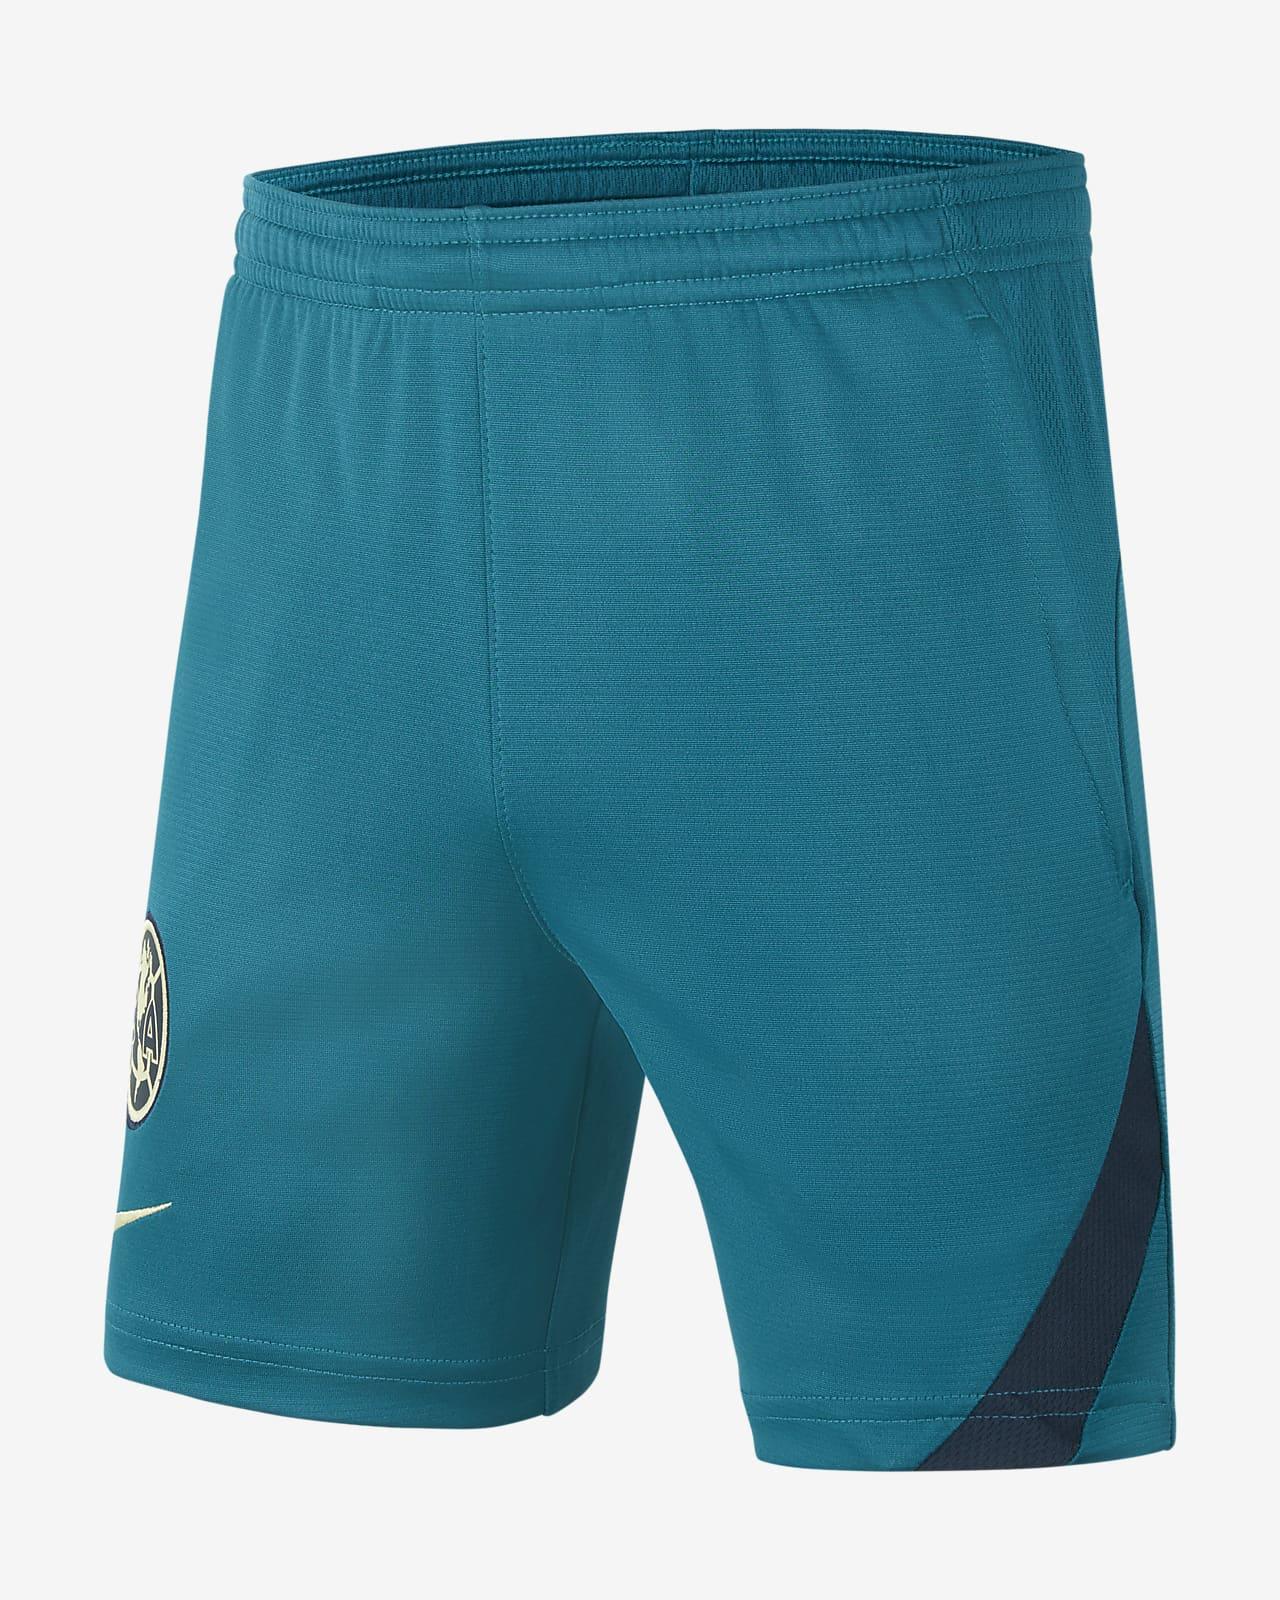 Shorts de fútbol para niños talla grande Club América Academy Pro